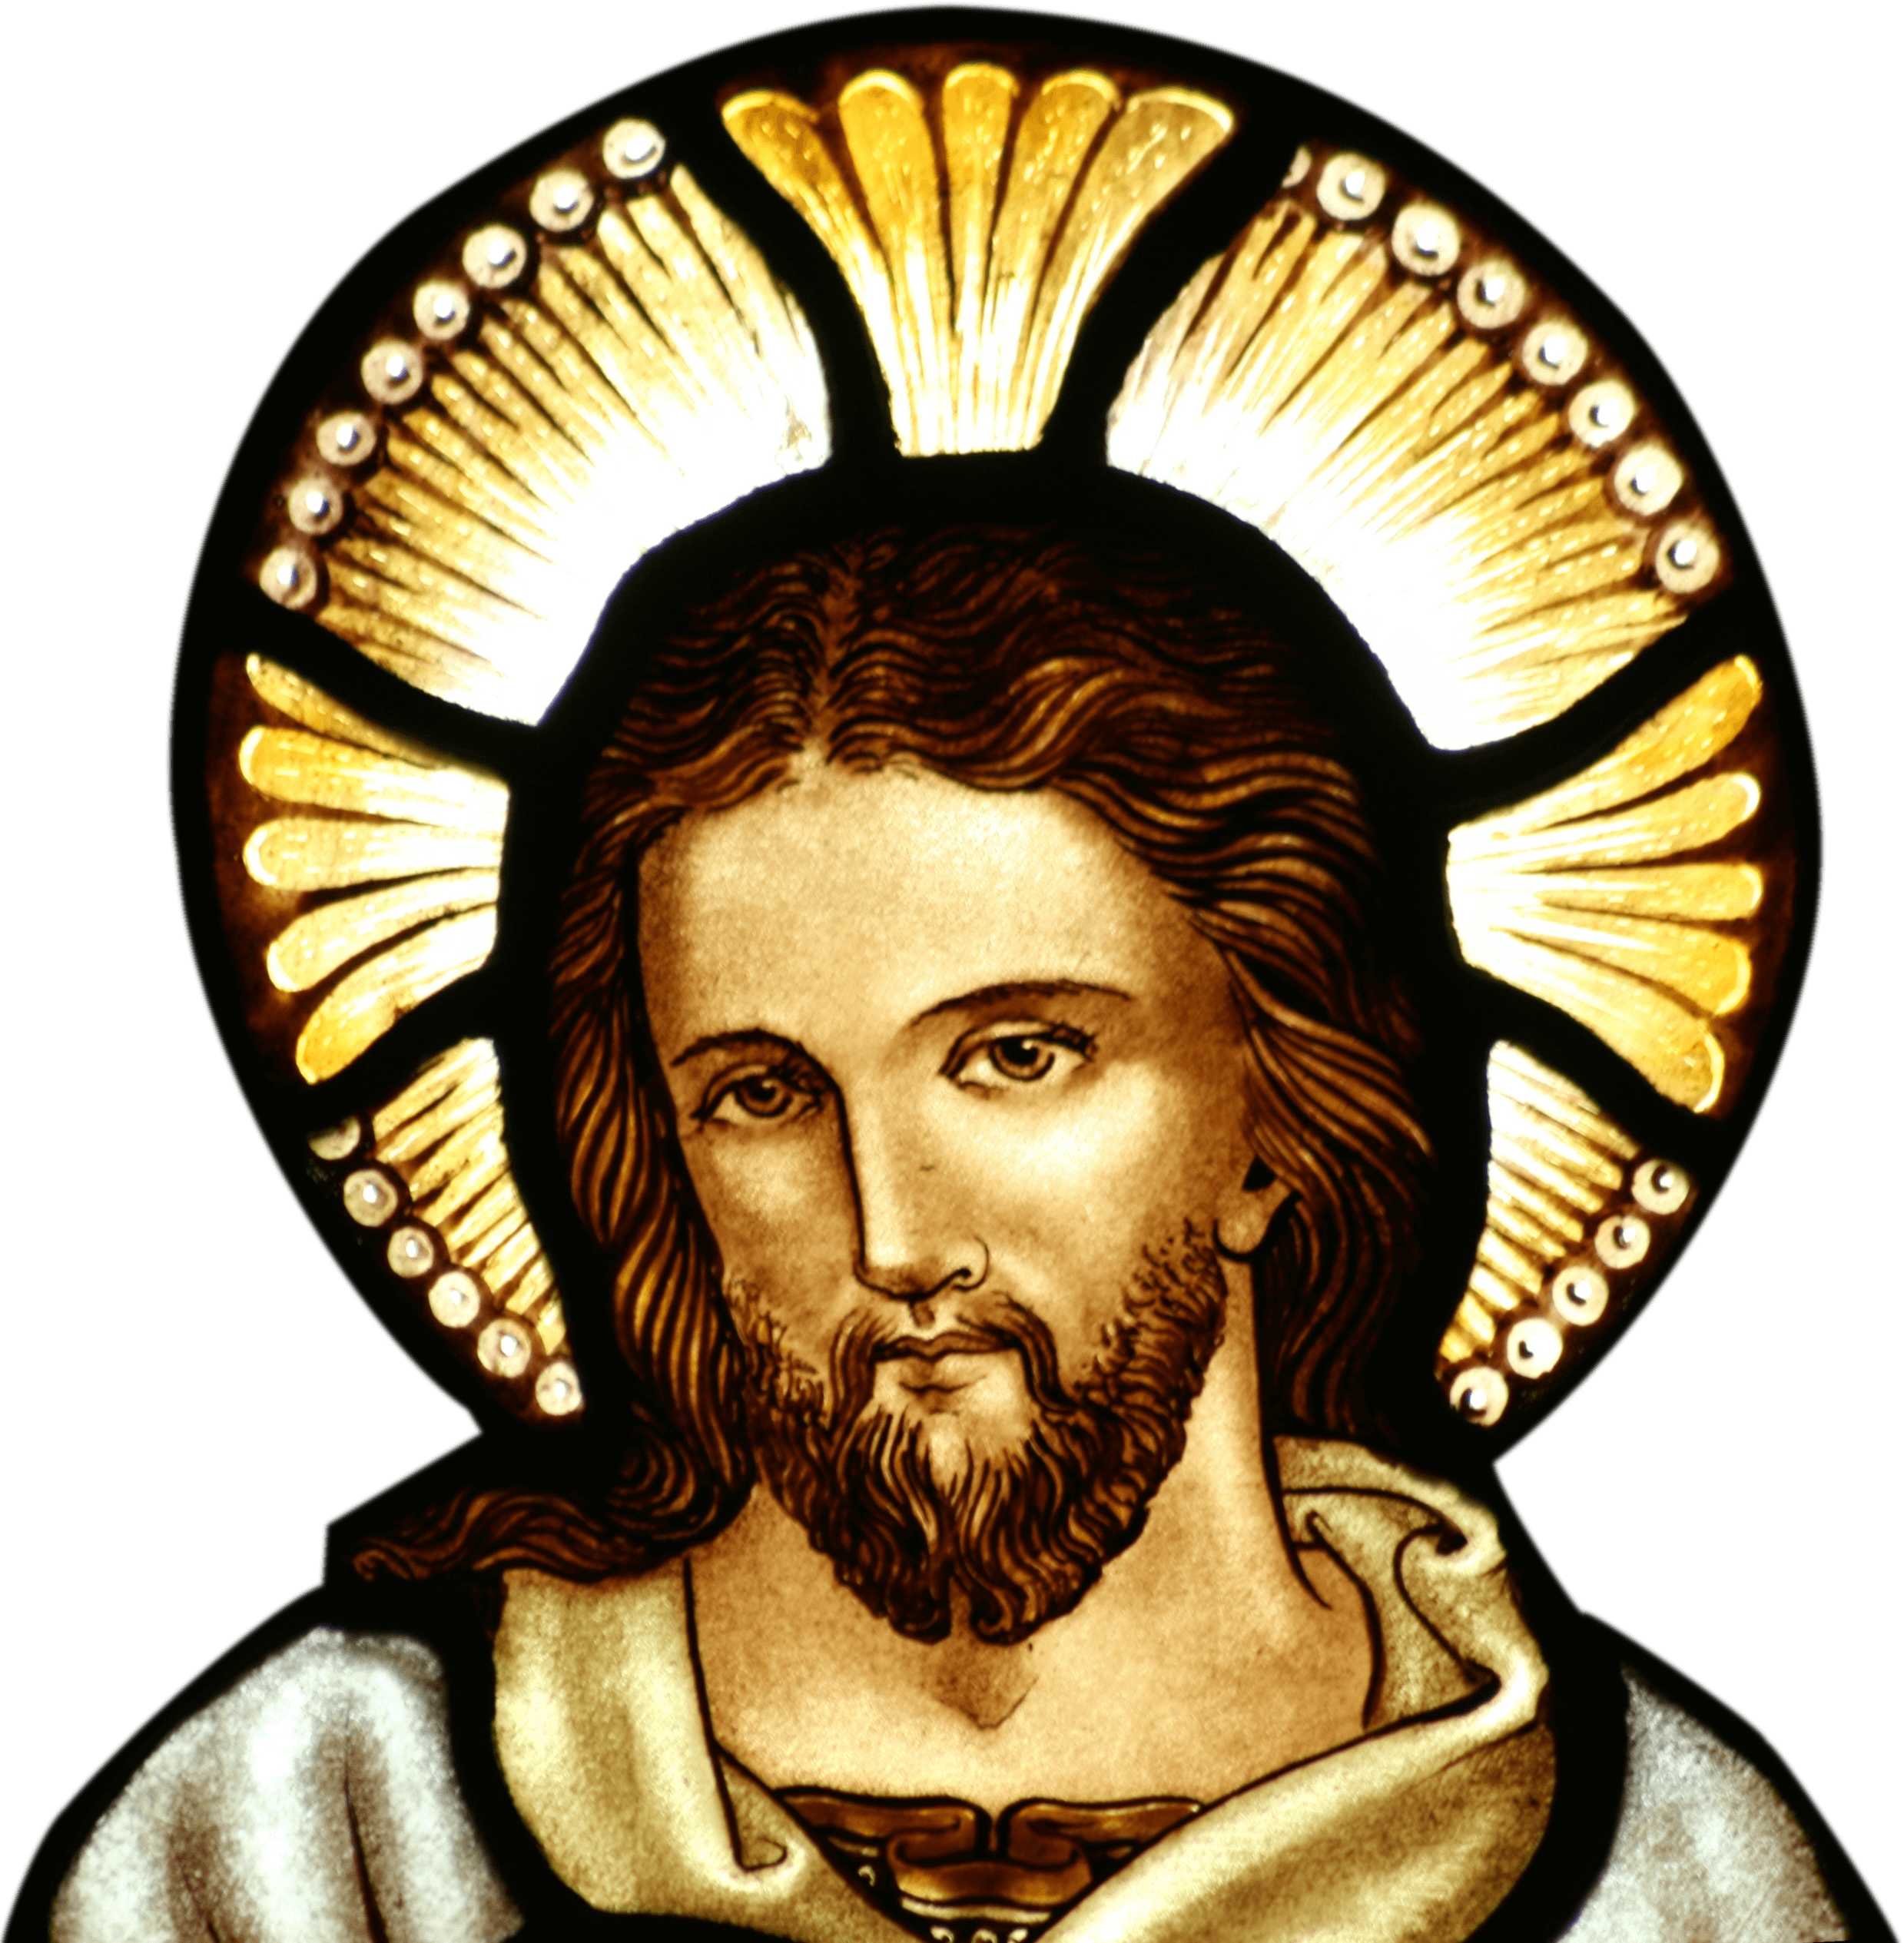 PNG Jesus - 69822